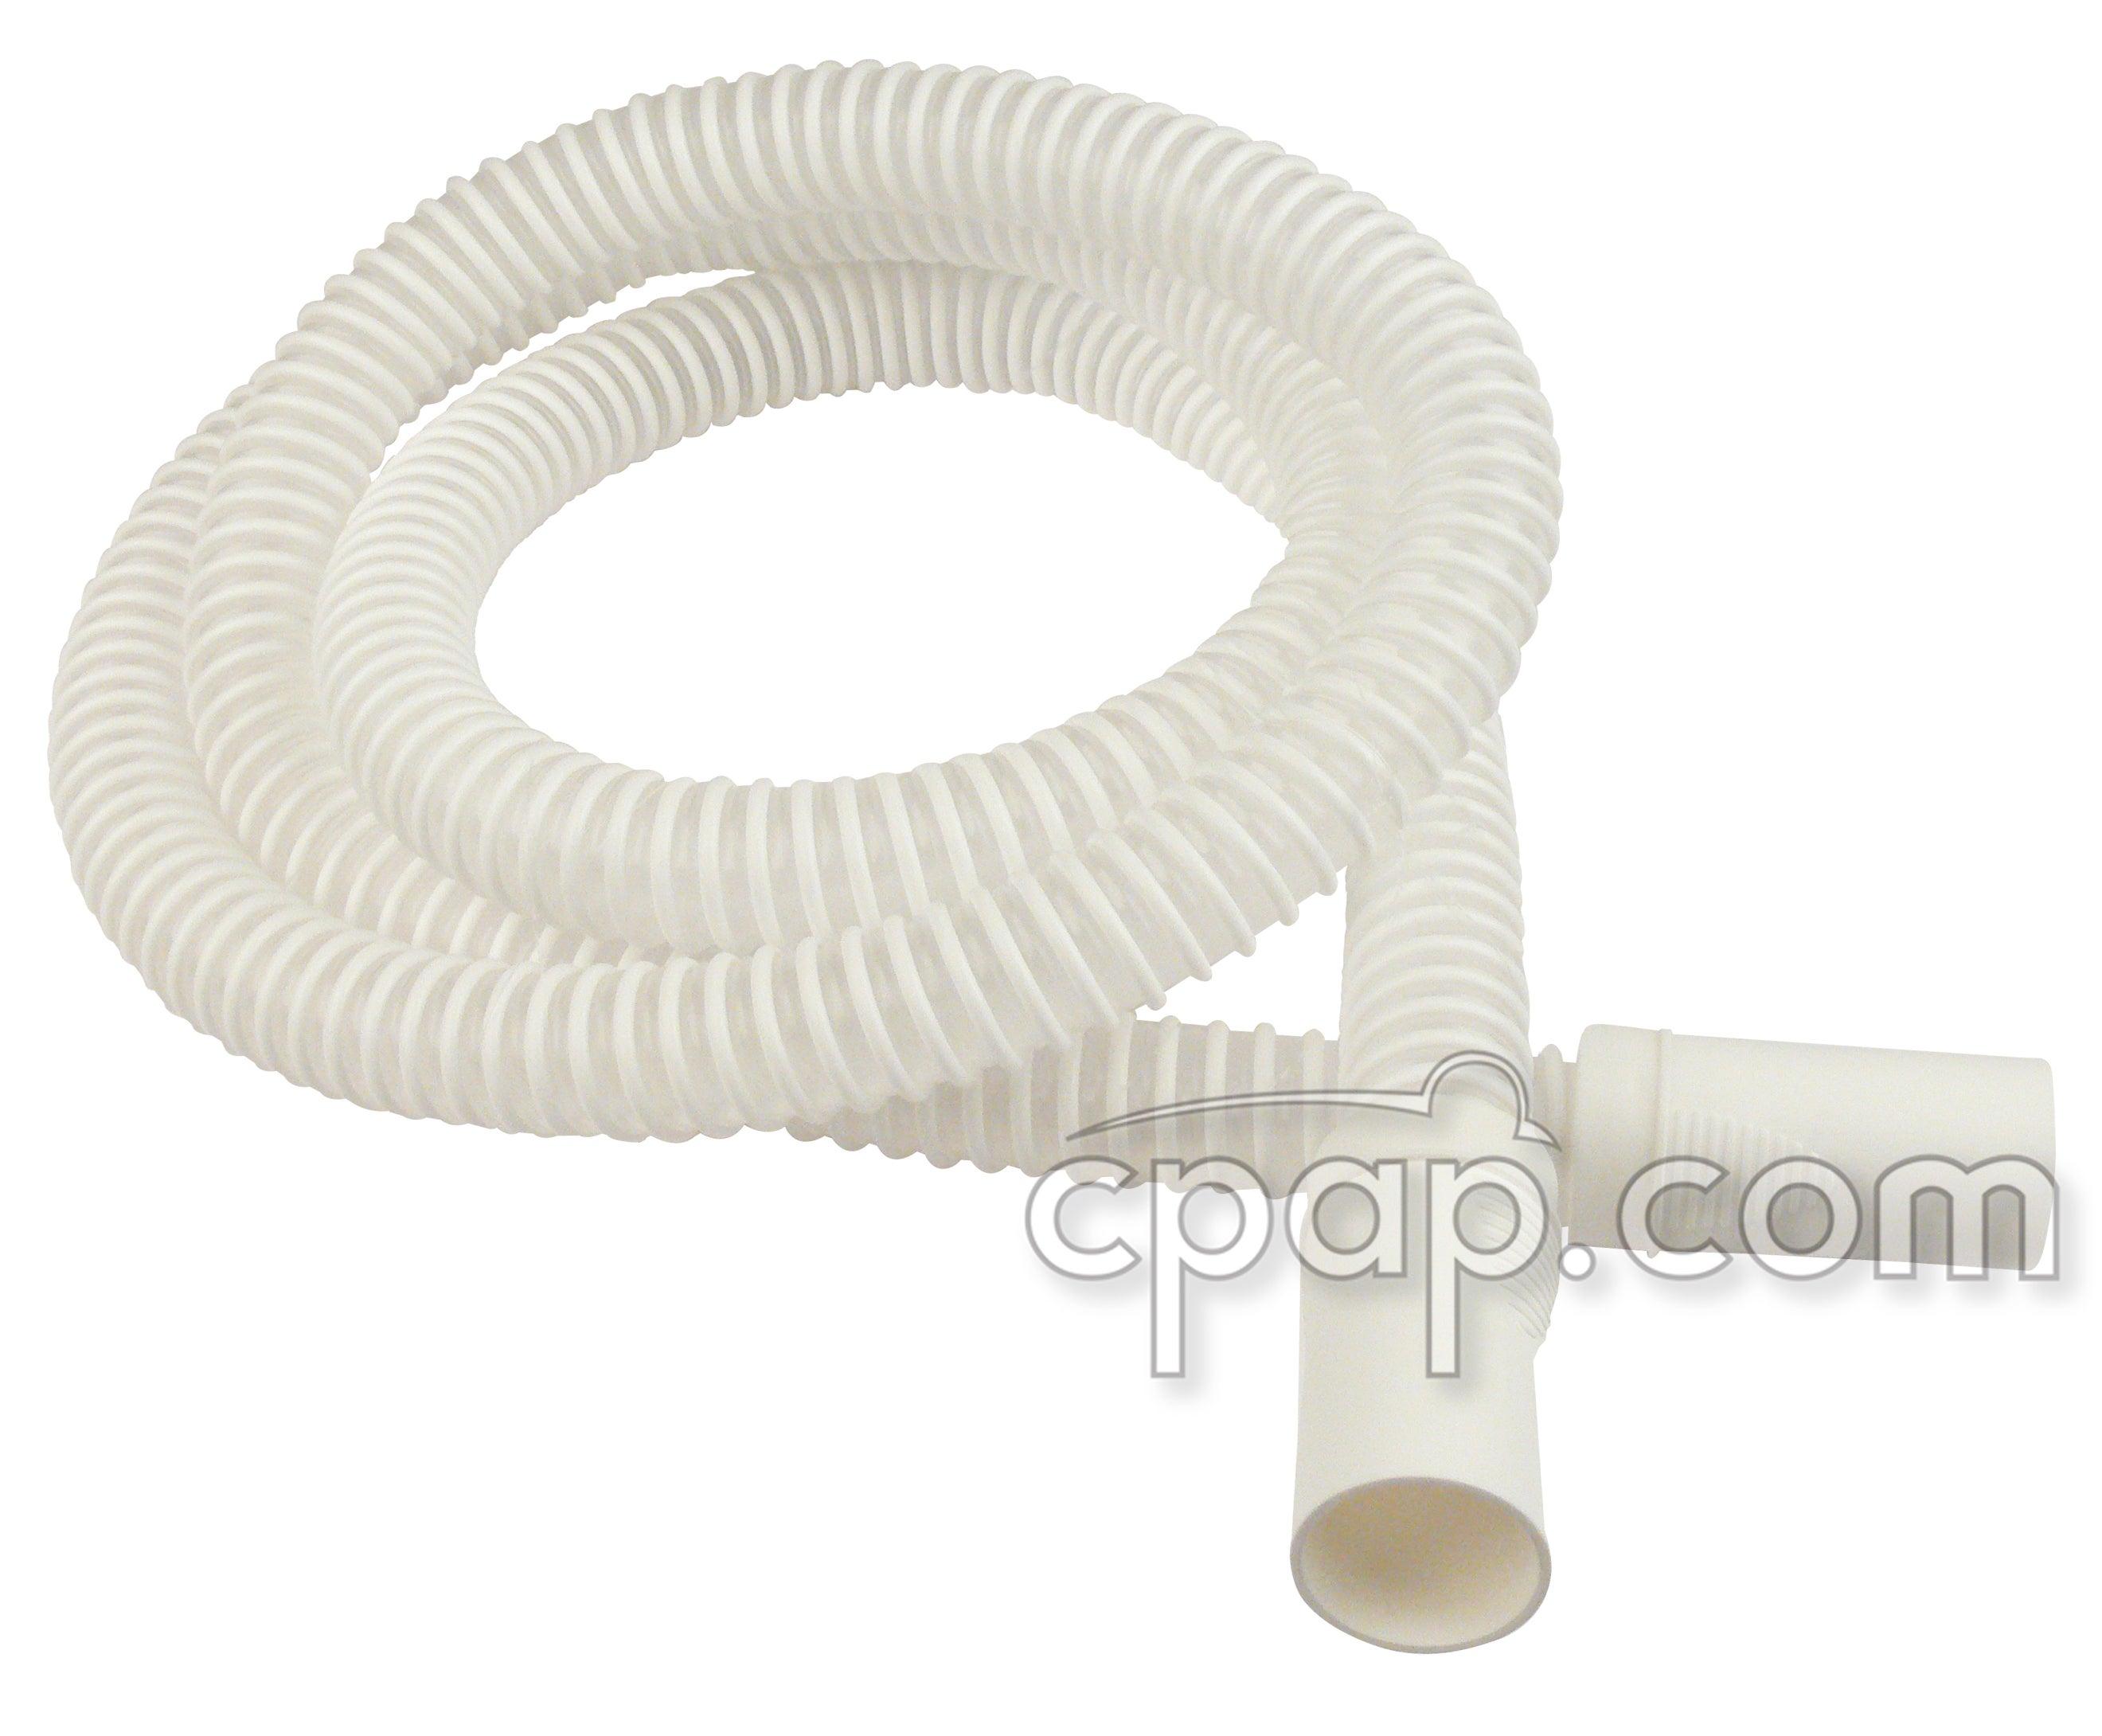 UltraLite Pure White Slim Cuff 6 Foot Performance CPAP/BiPAP Tubing